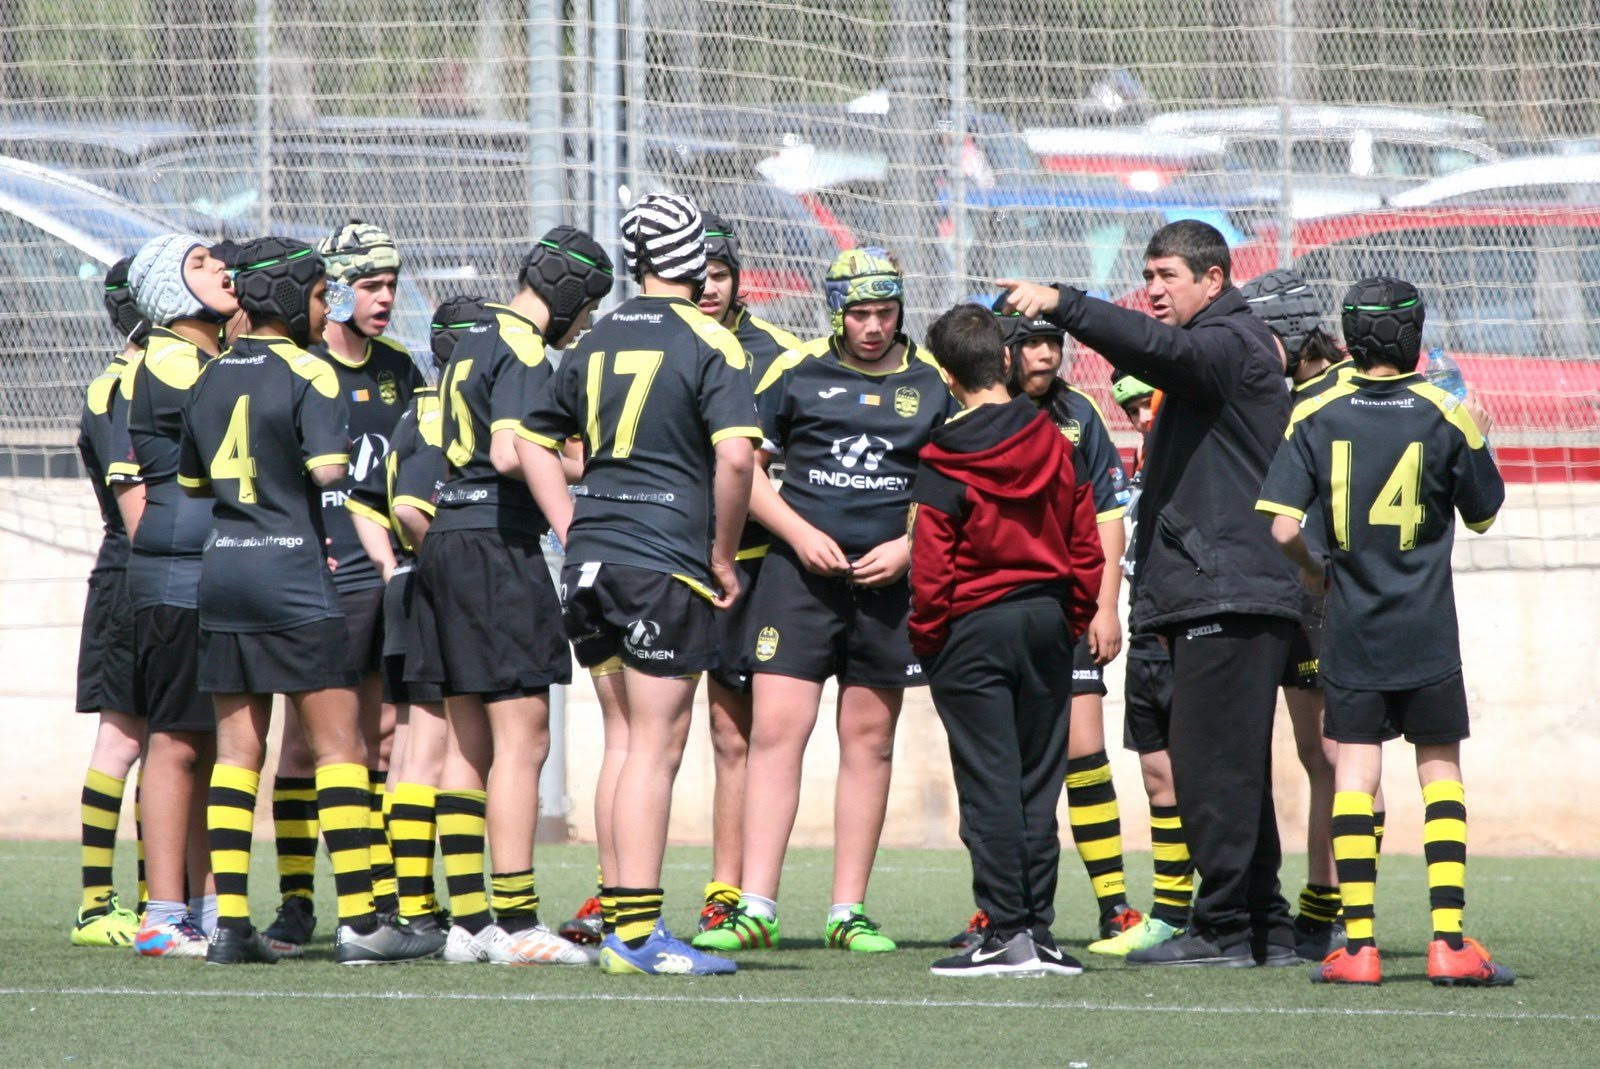 torneo nacional Oliva - tatami rugby